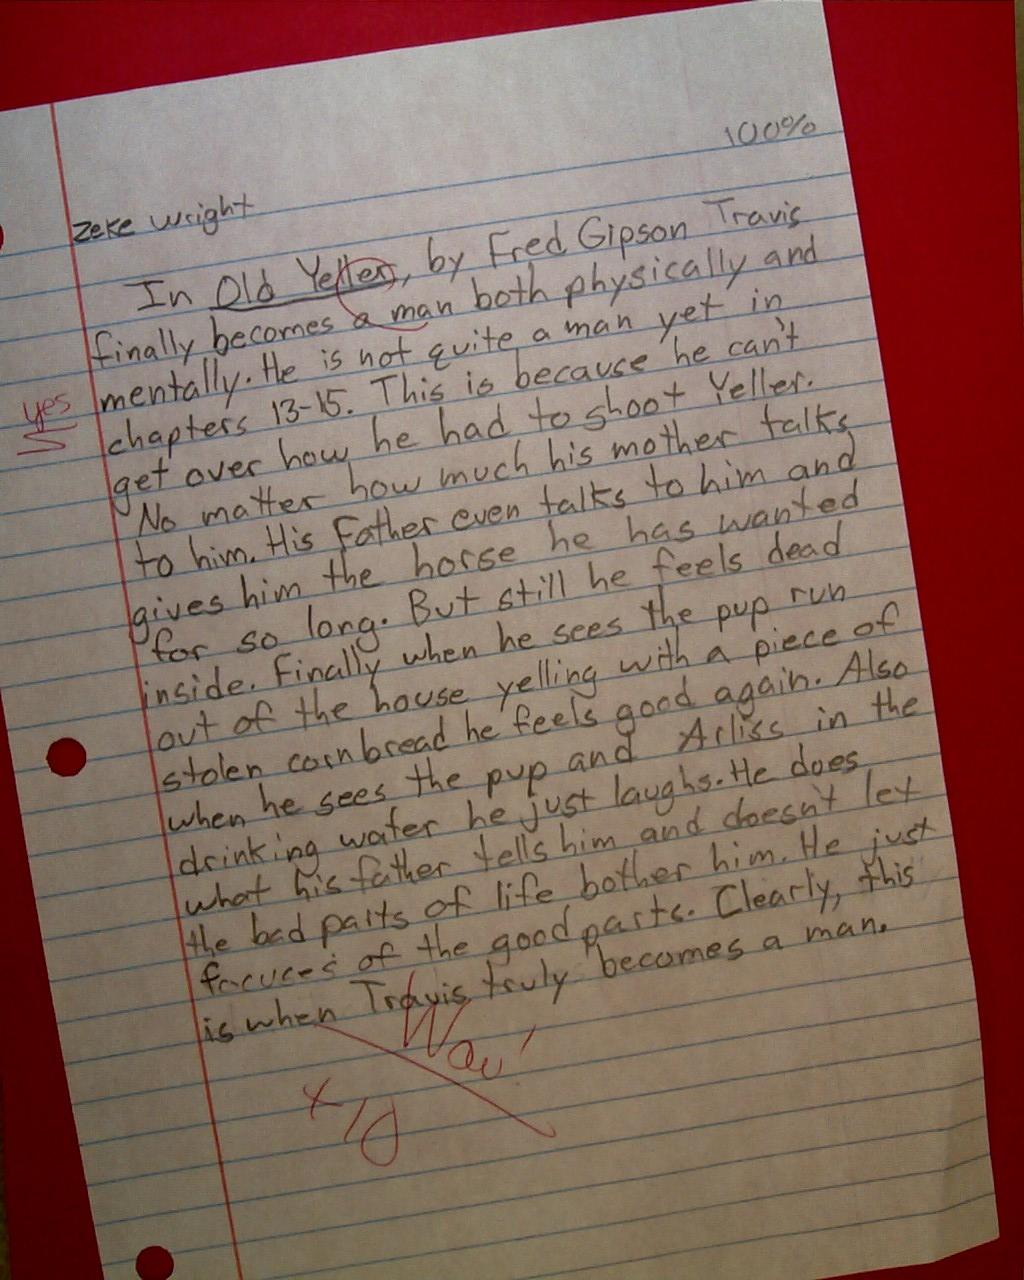 Persuasive Essay Ideas For High School  Essay Thesis also Health Promotion Essays Old Yeller Essay English Literature Essay